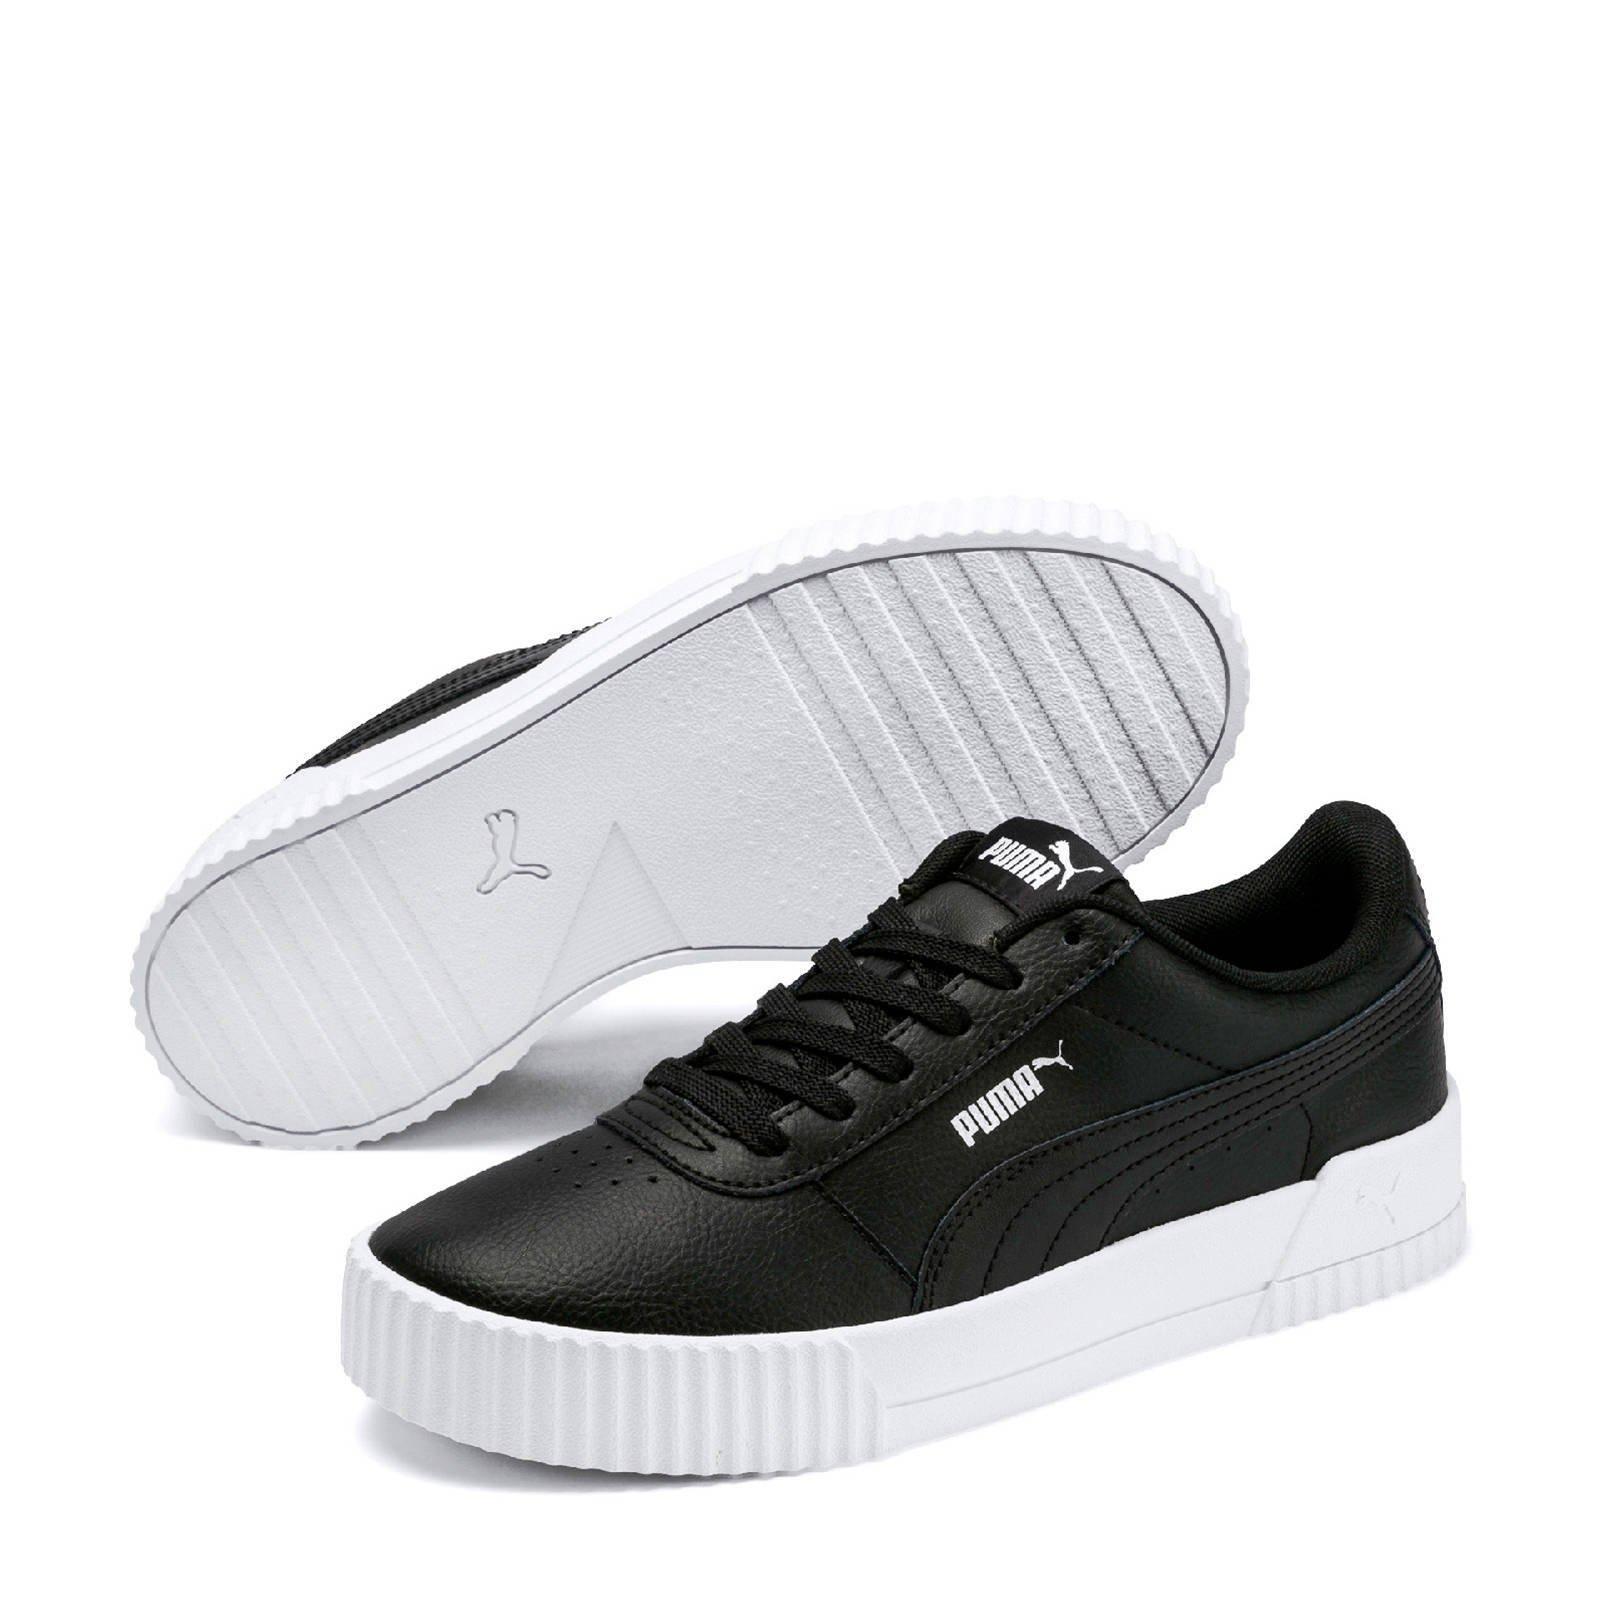 Puma Carina L sneakers zwart/wit | wehkamp